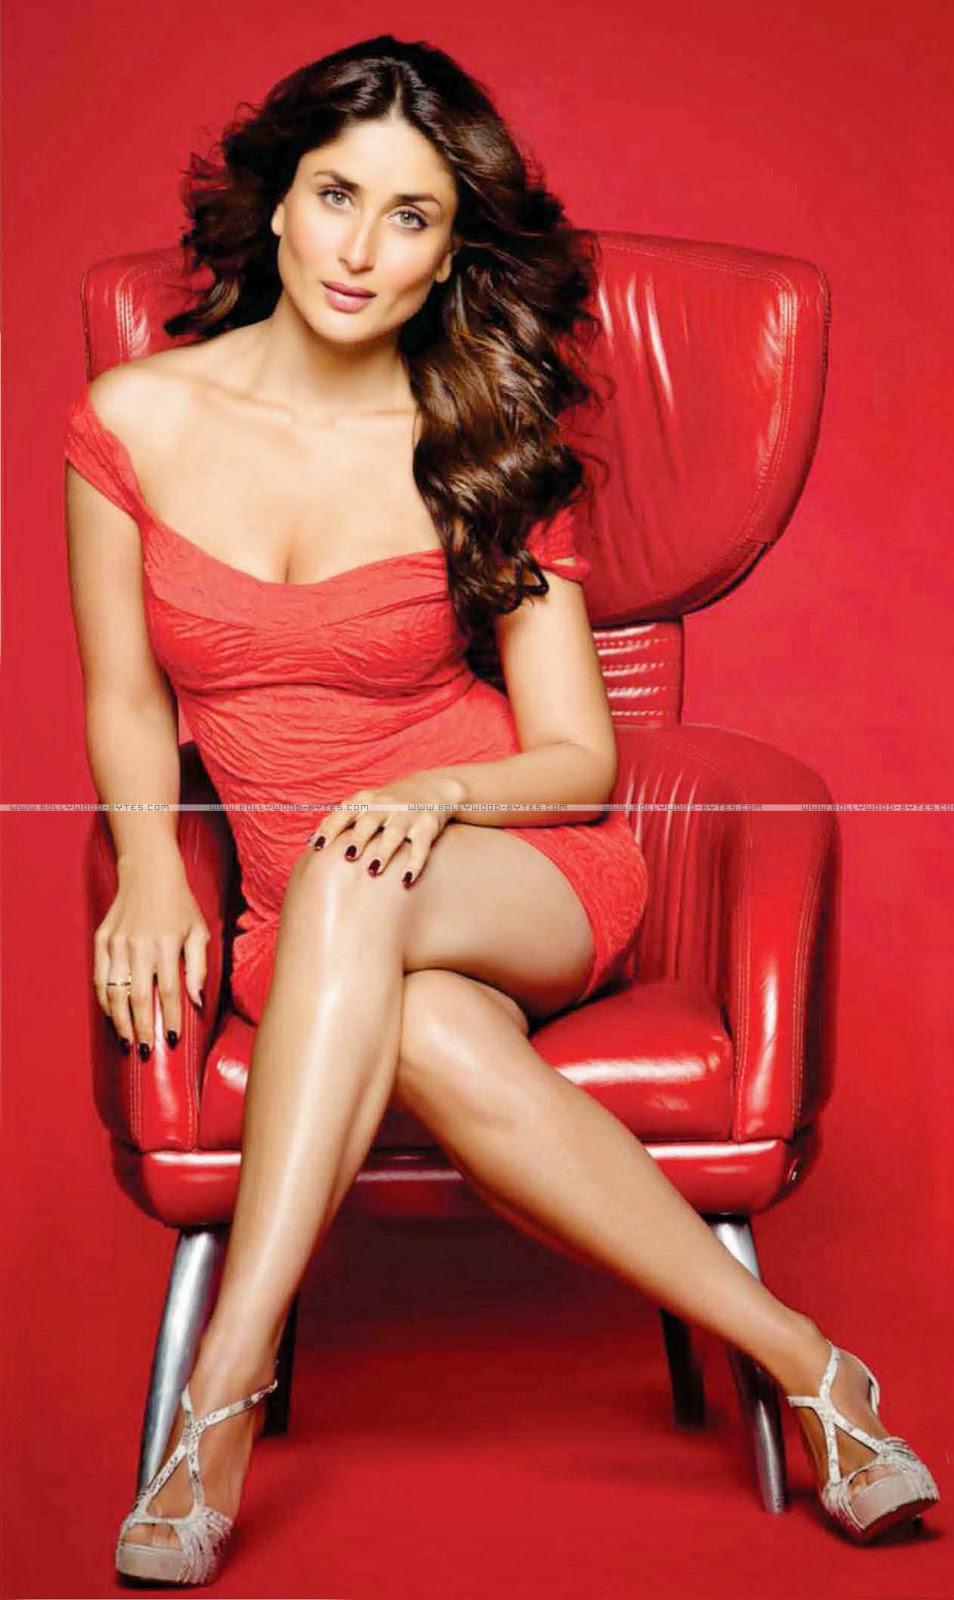 Kareena Kapoor's Dabboo Ratnani Photoshoot